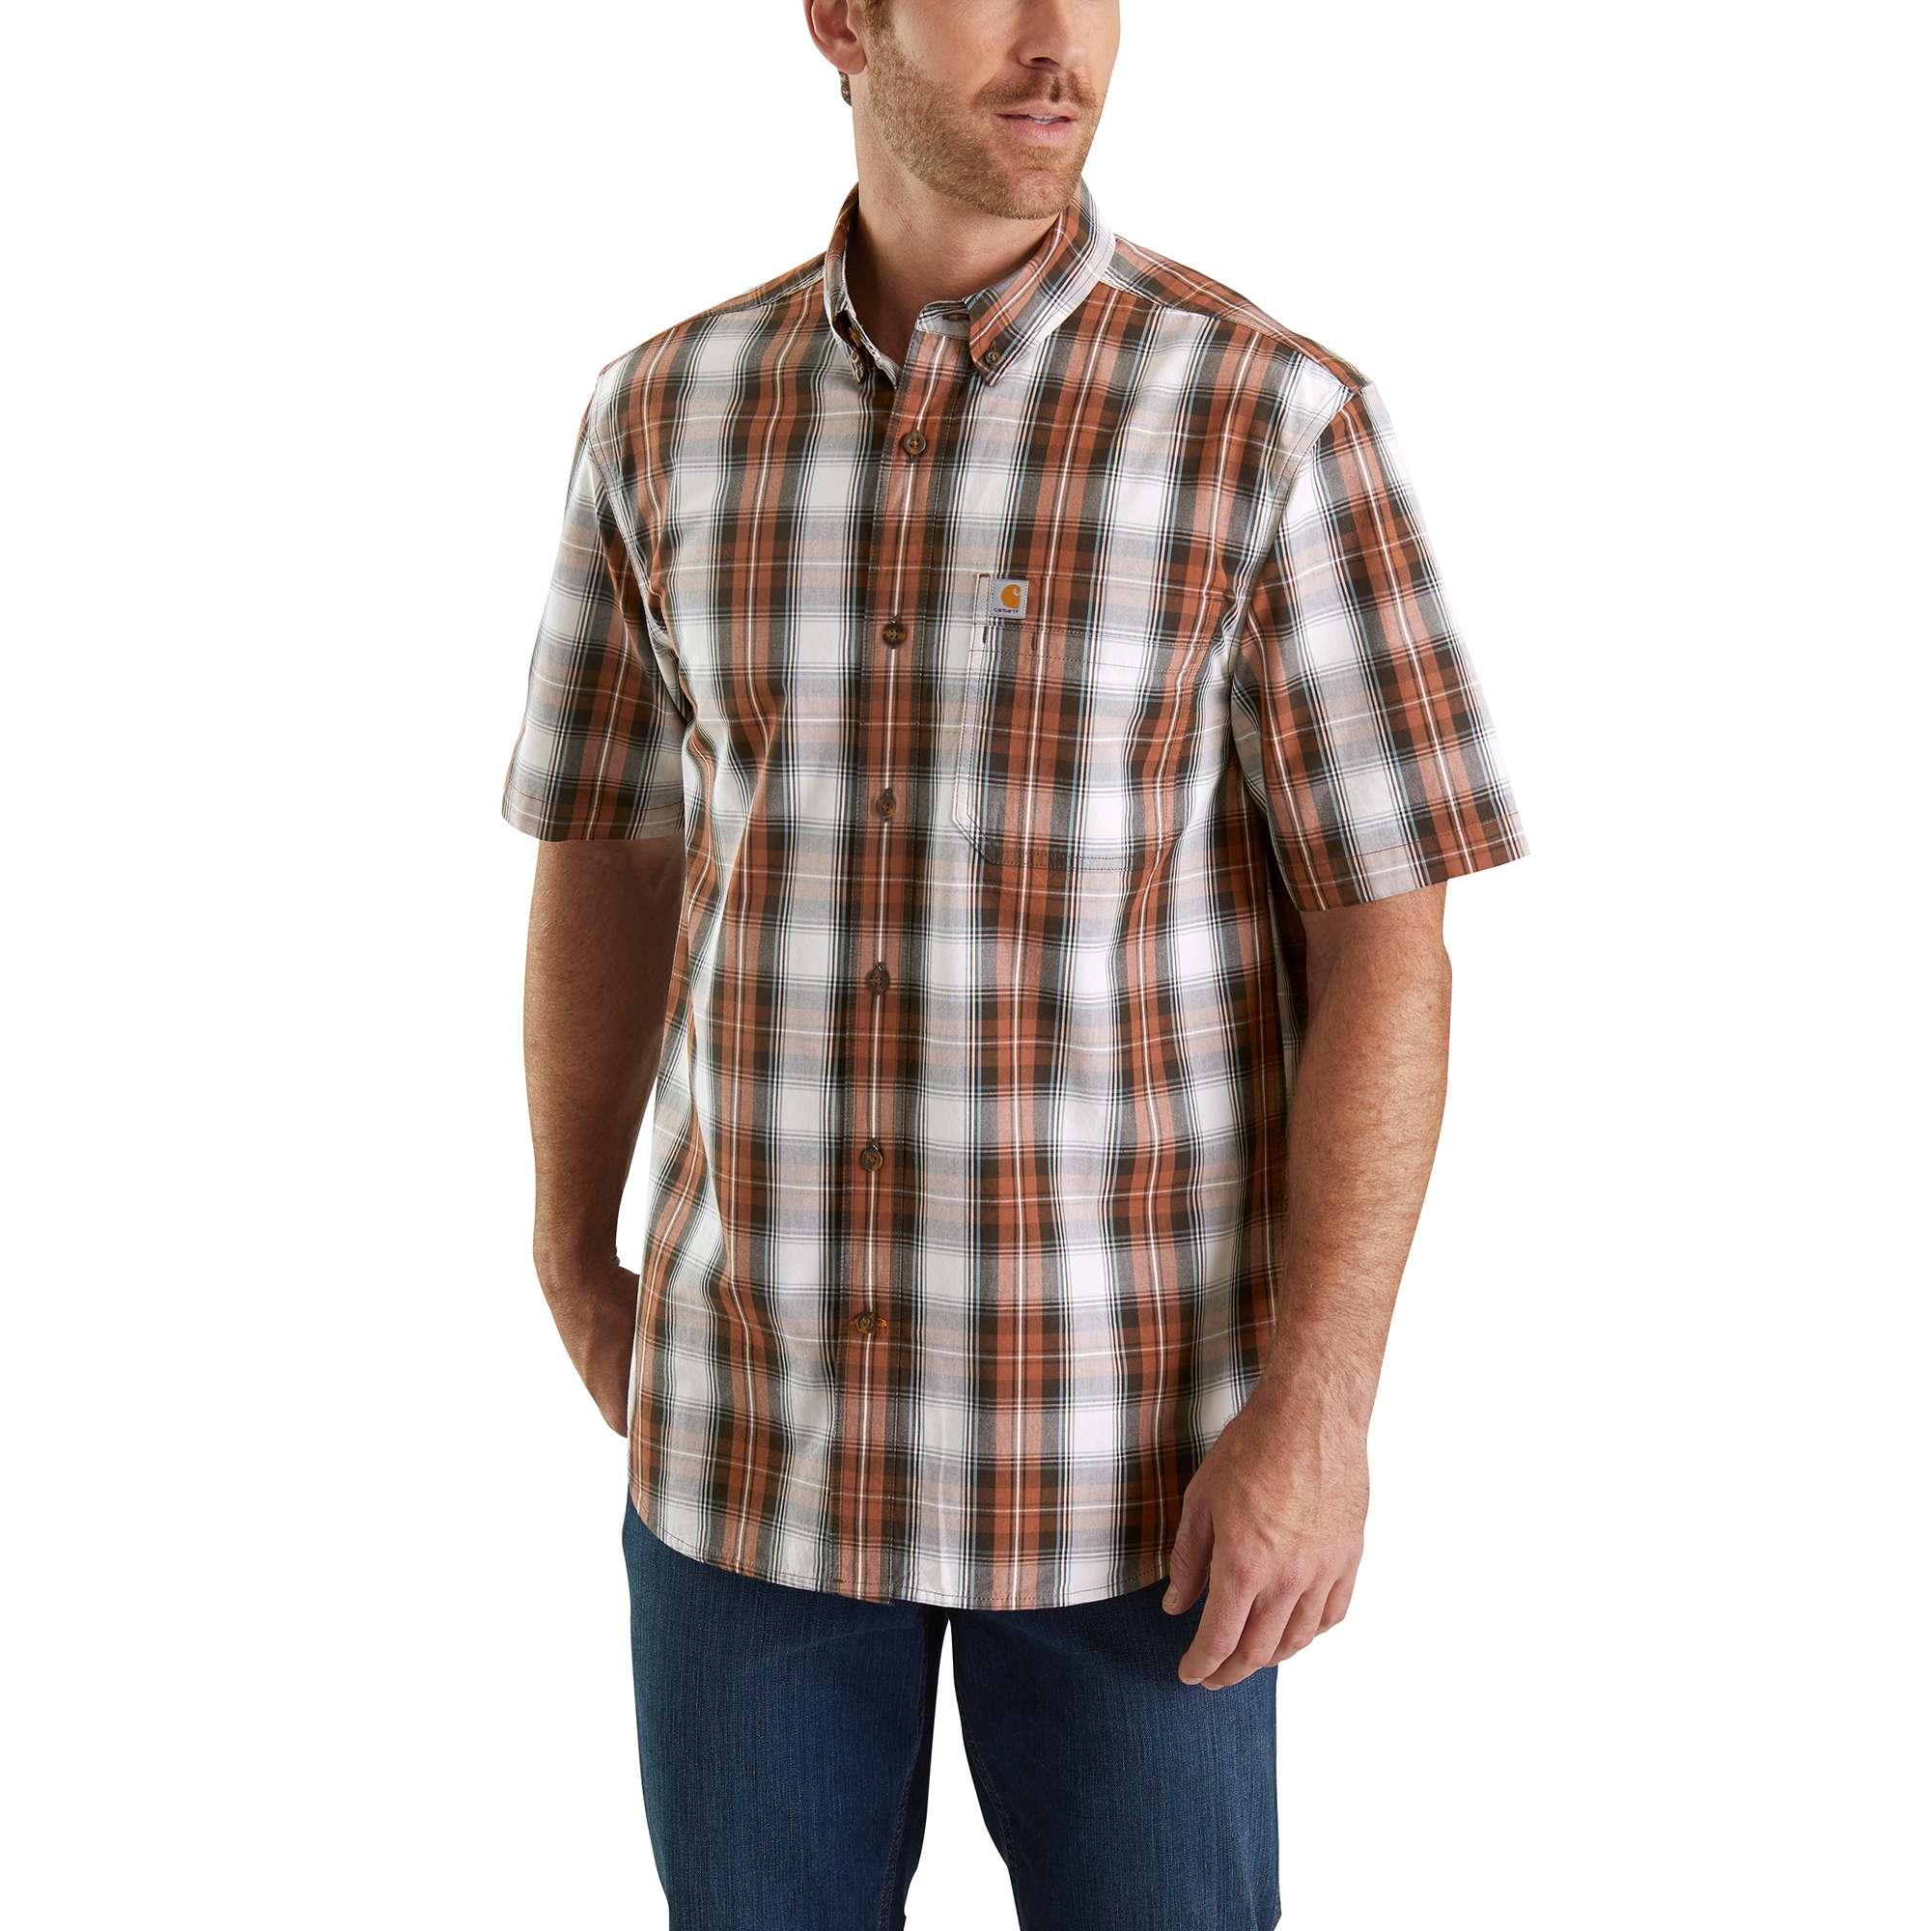 Men's Essential Plaid Button Down Shirt, Burnt Orange, swatch